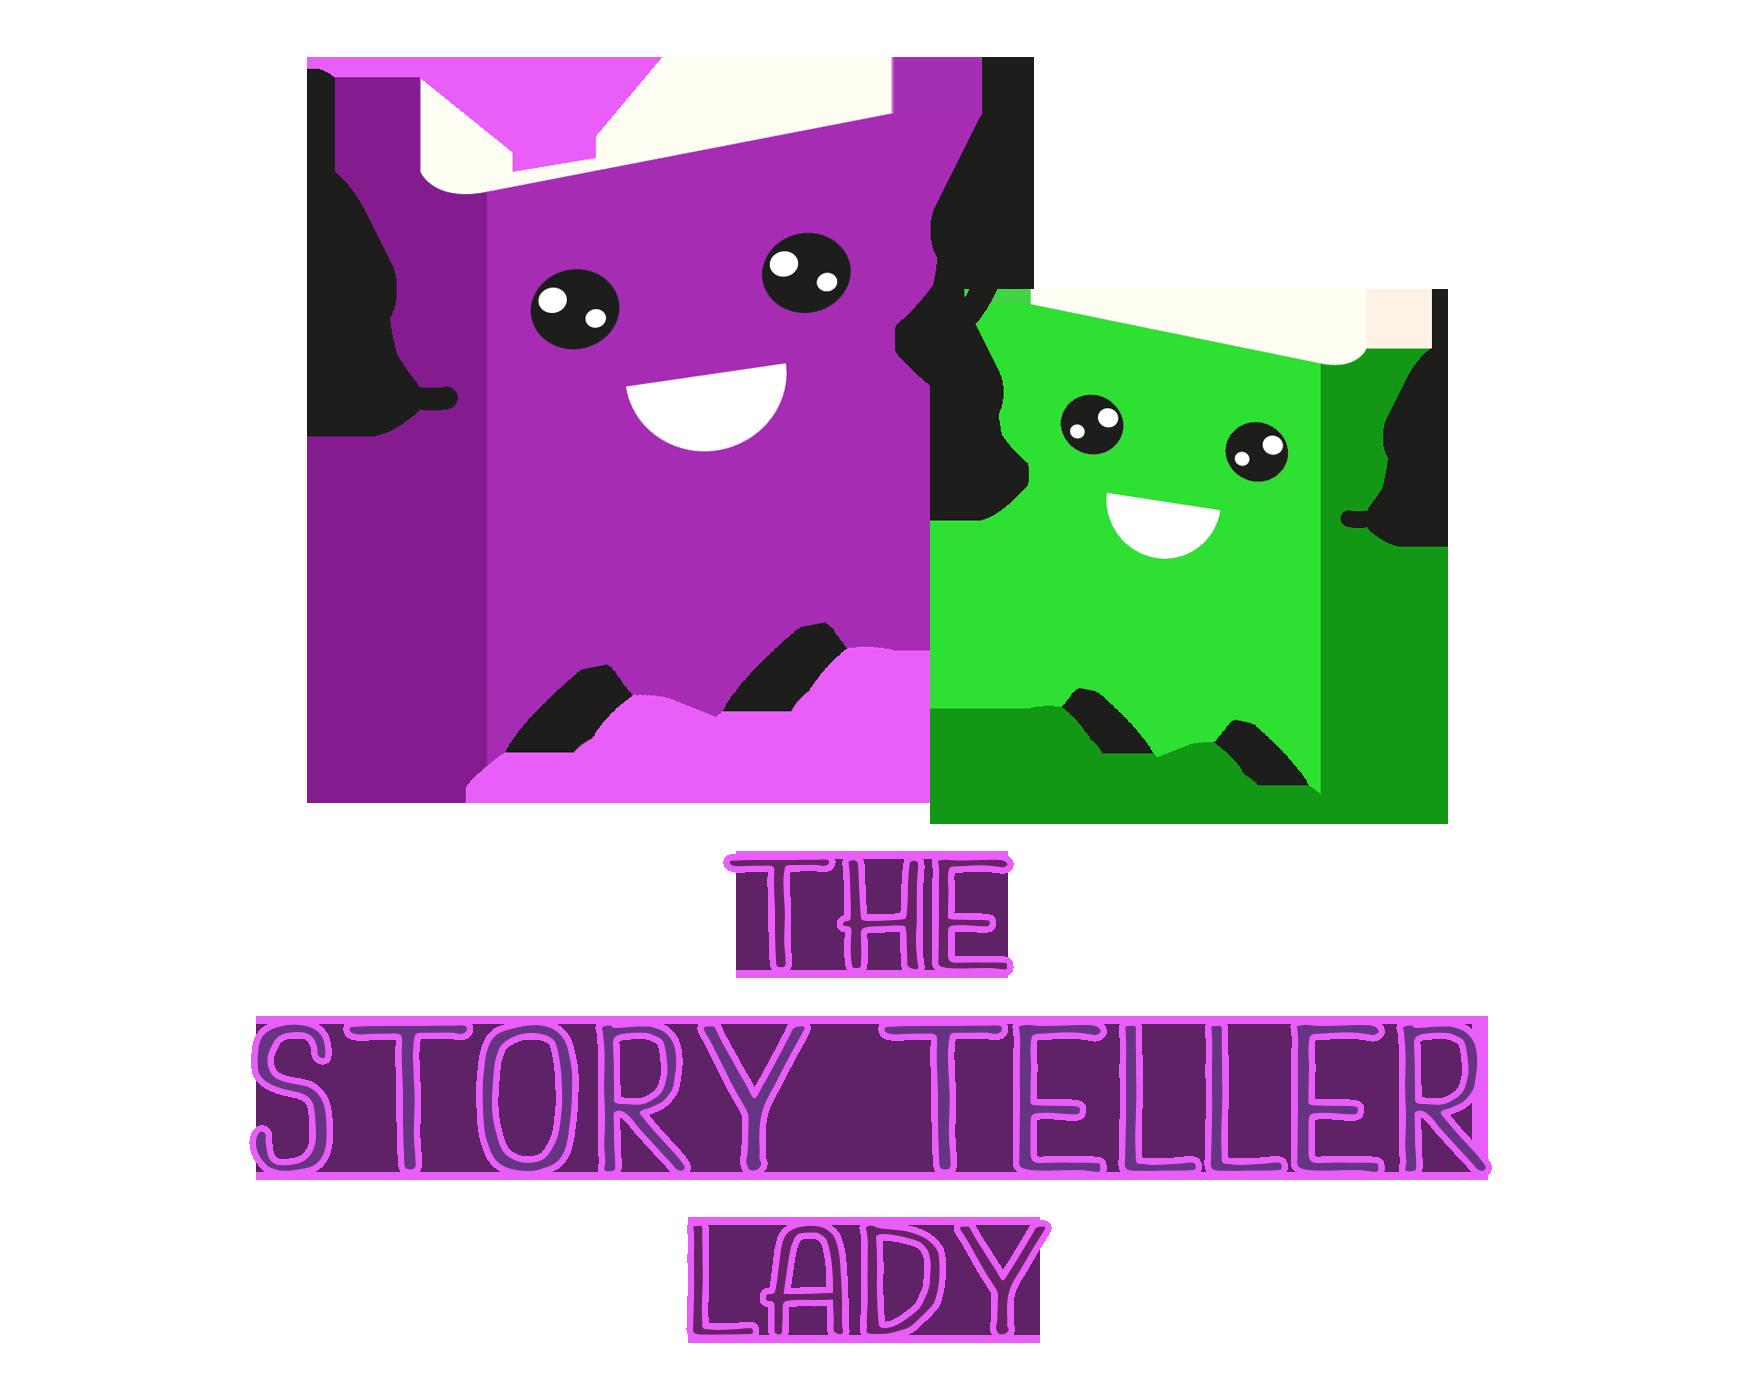 Story Teller Lady